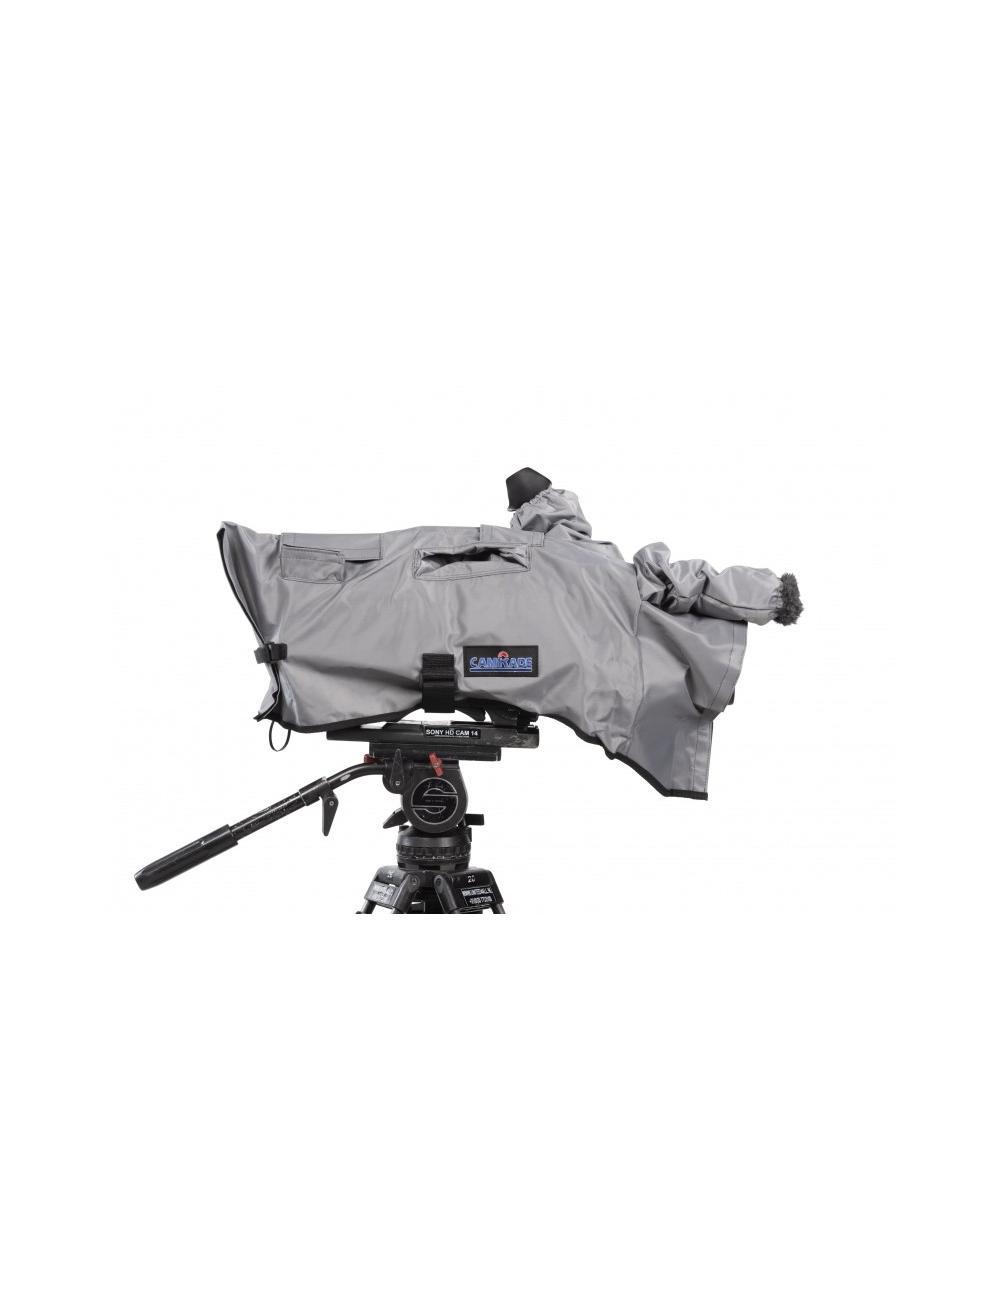 camRade wetSuit EFP Handheld